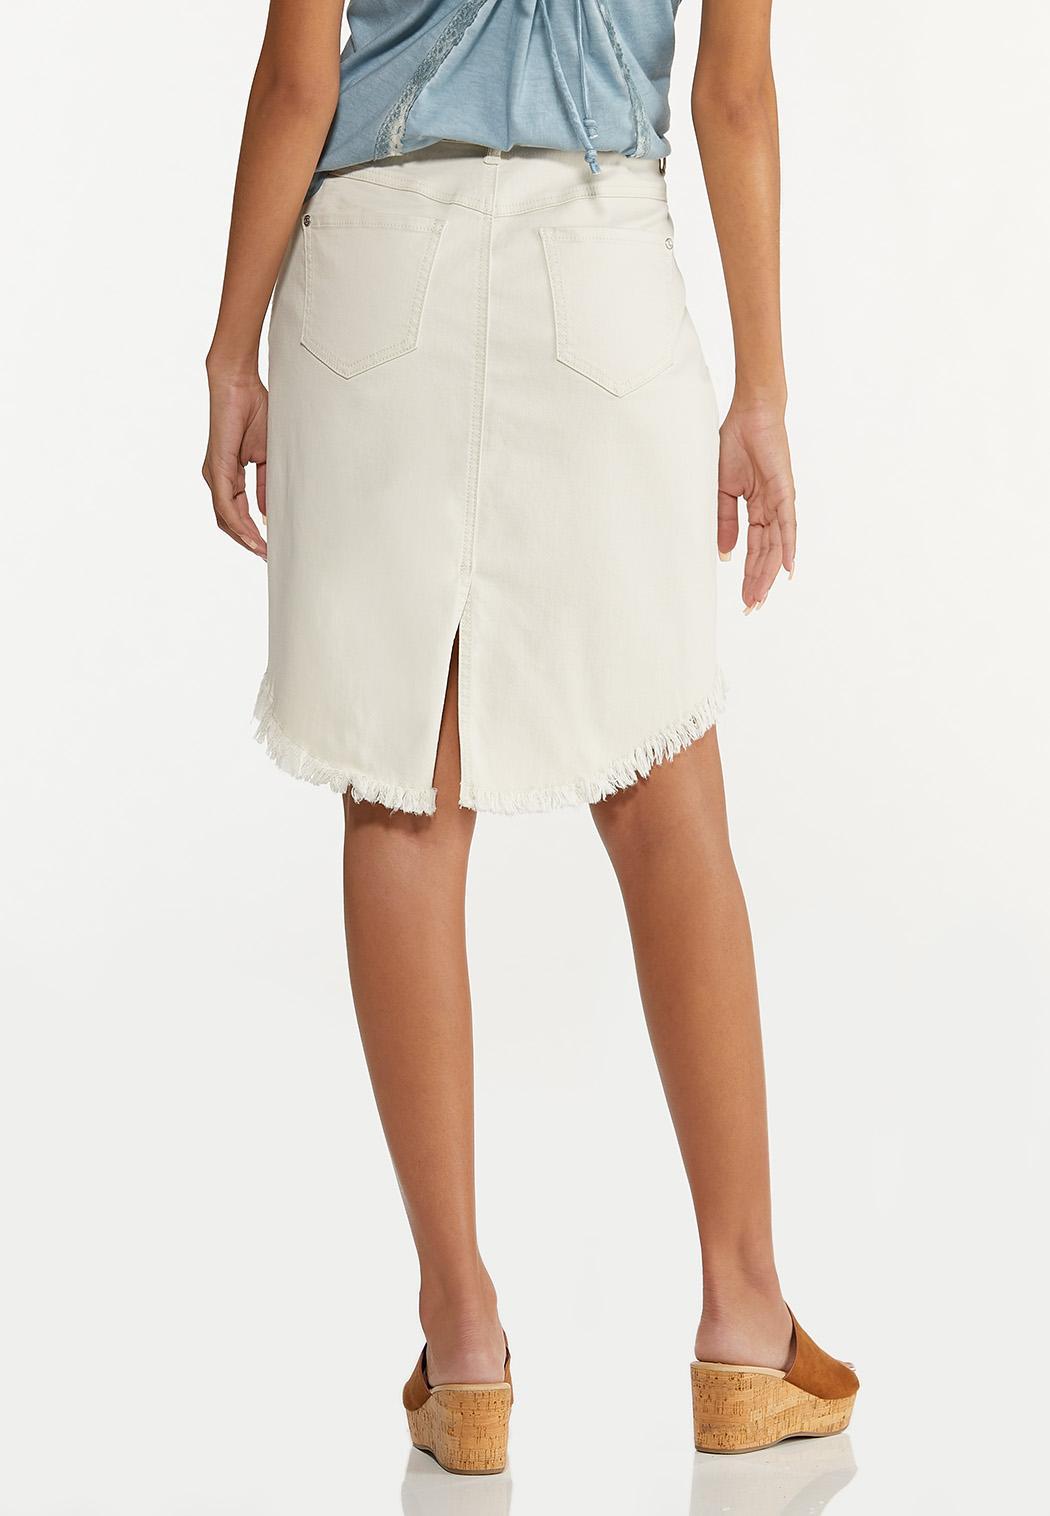 Curved Frayed Denim Skirt (Item #44627584)